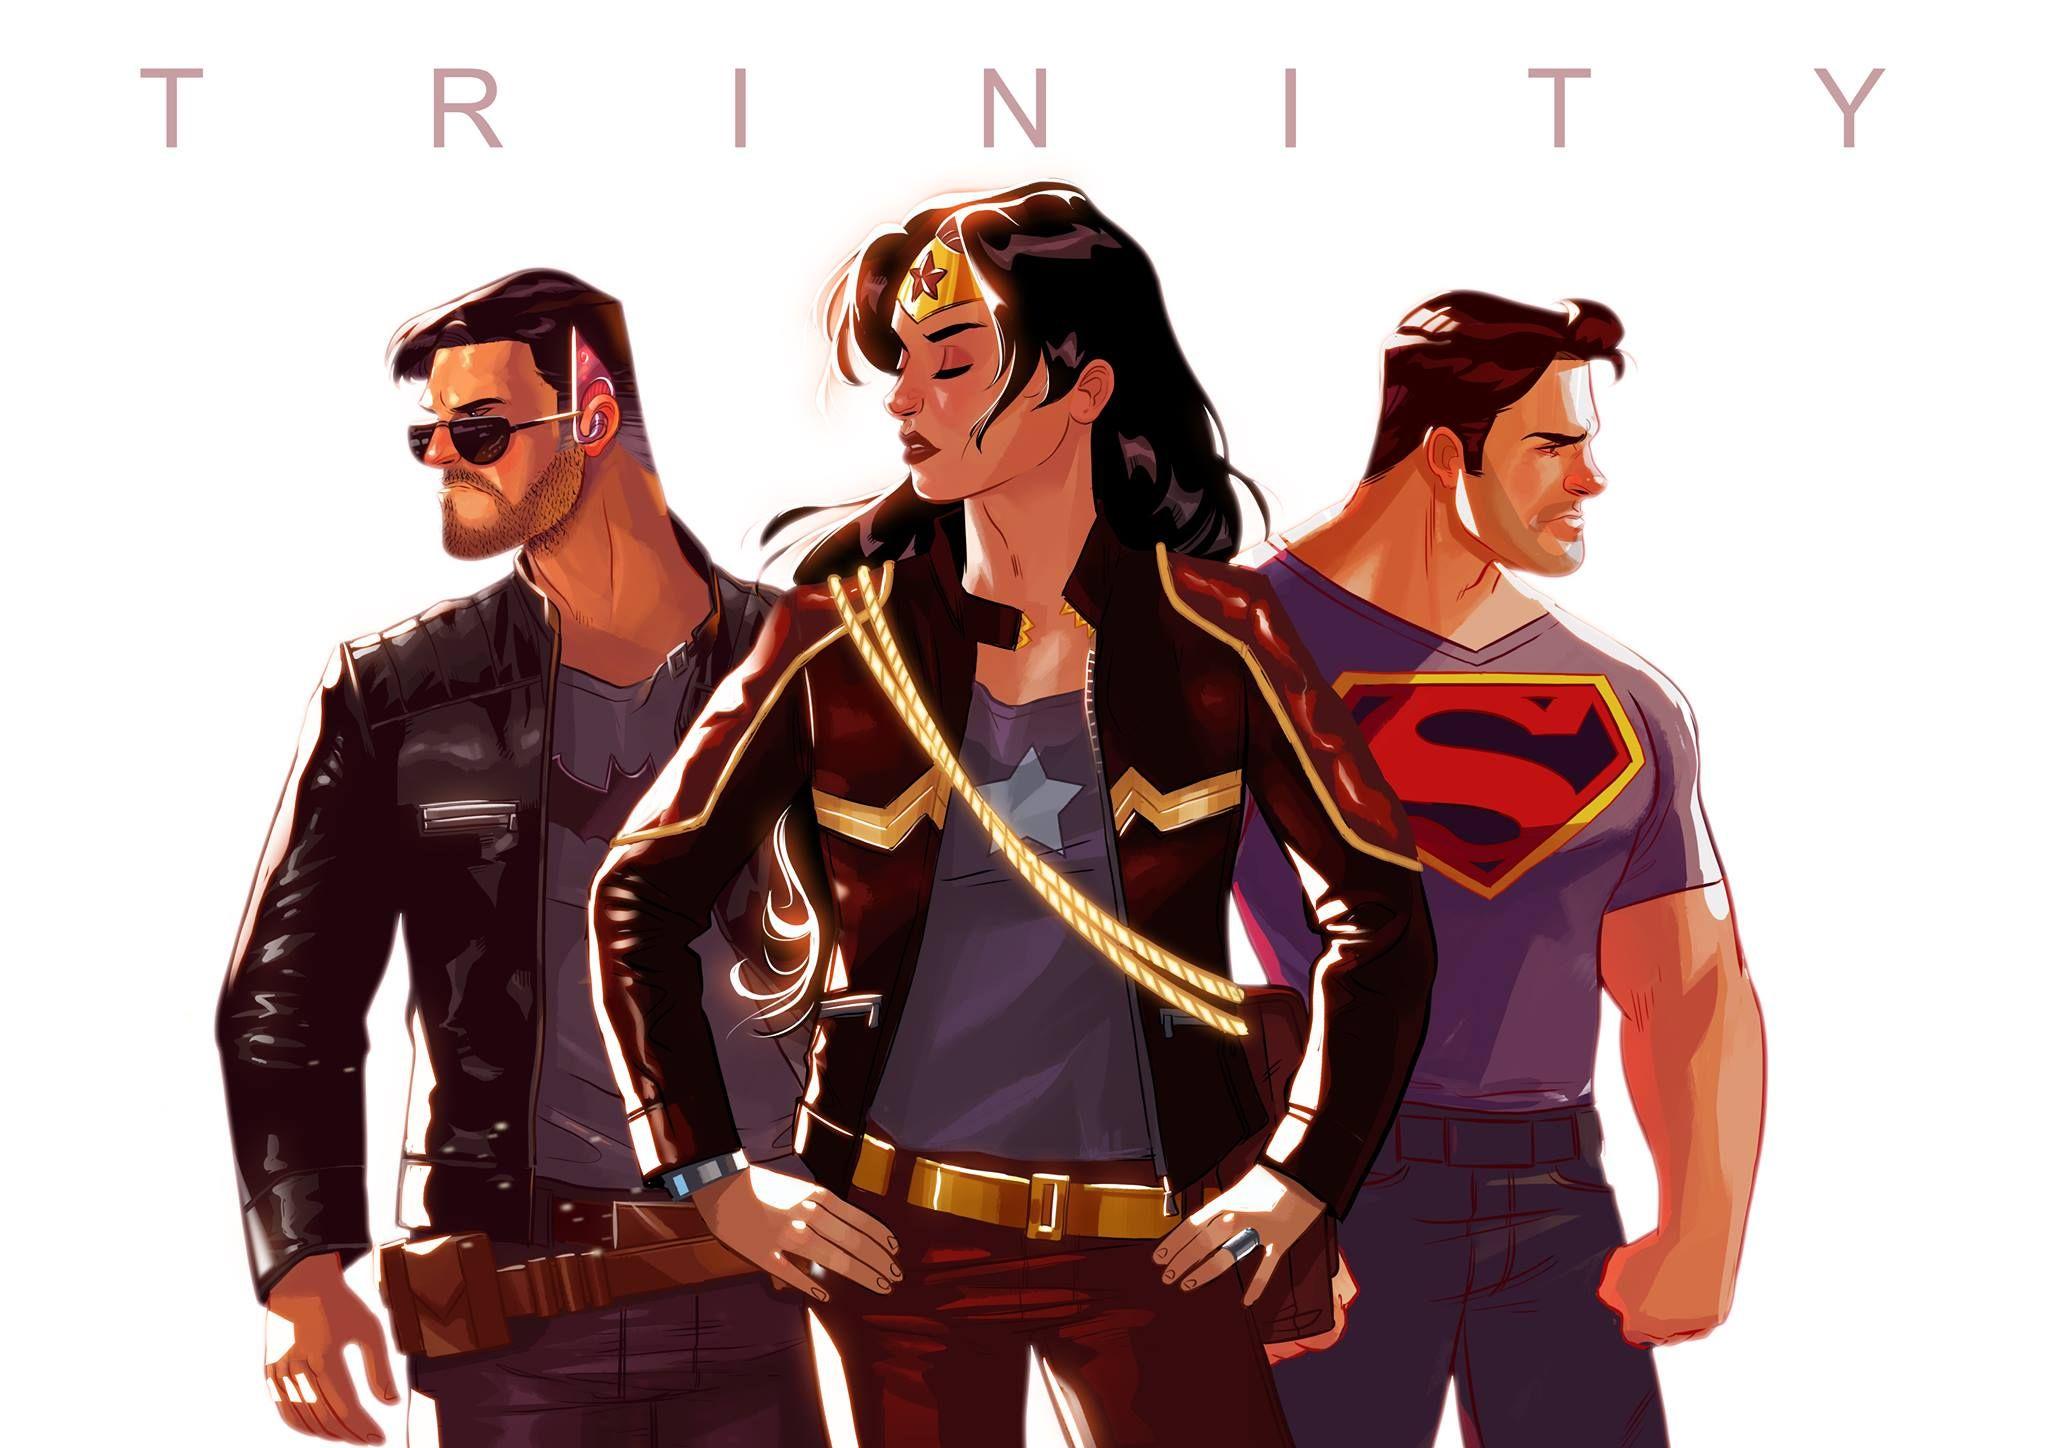 Trinity (Batman, Wonder Woman, Superman), by Stephen Byrne. Cool urban look for this heroes.